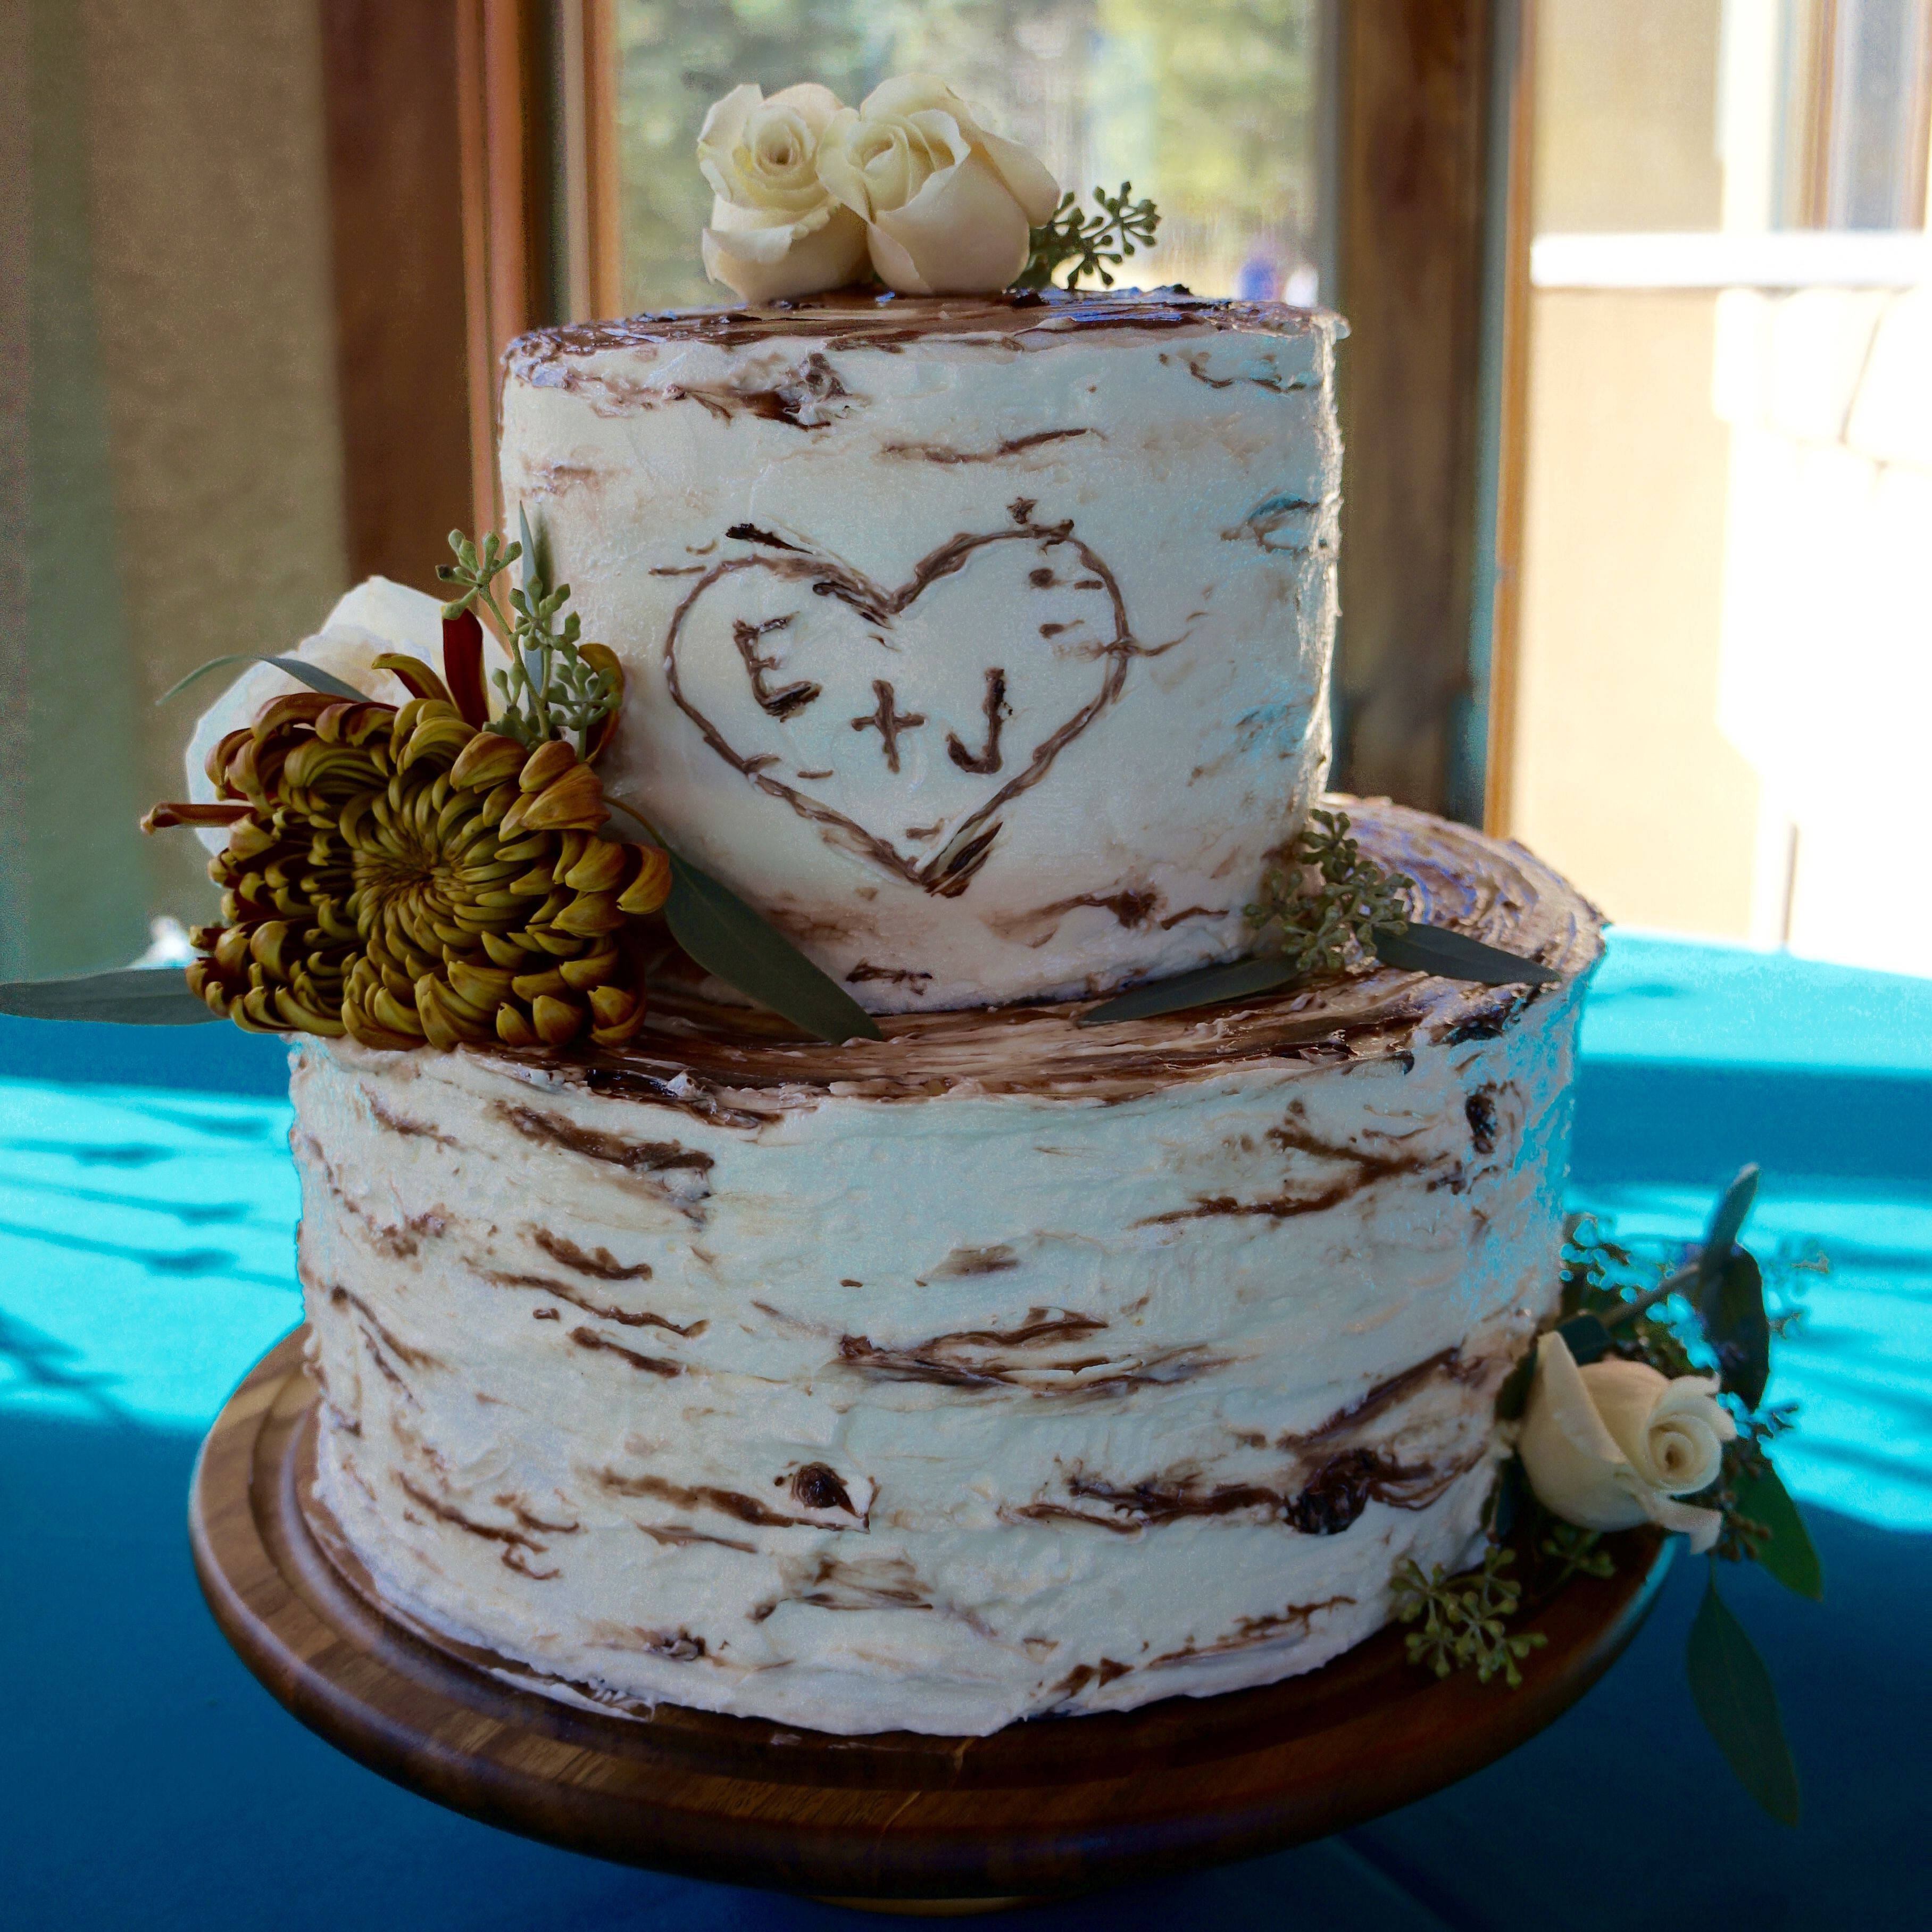 Top Wedding Cake Trends For Rustic Birch Tree Cake